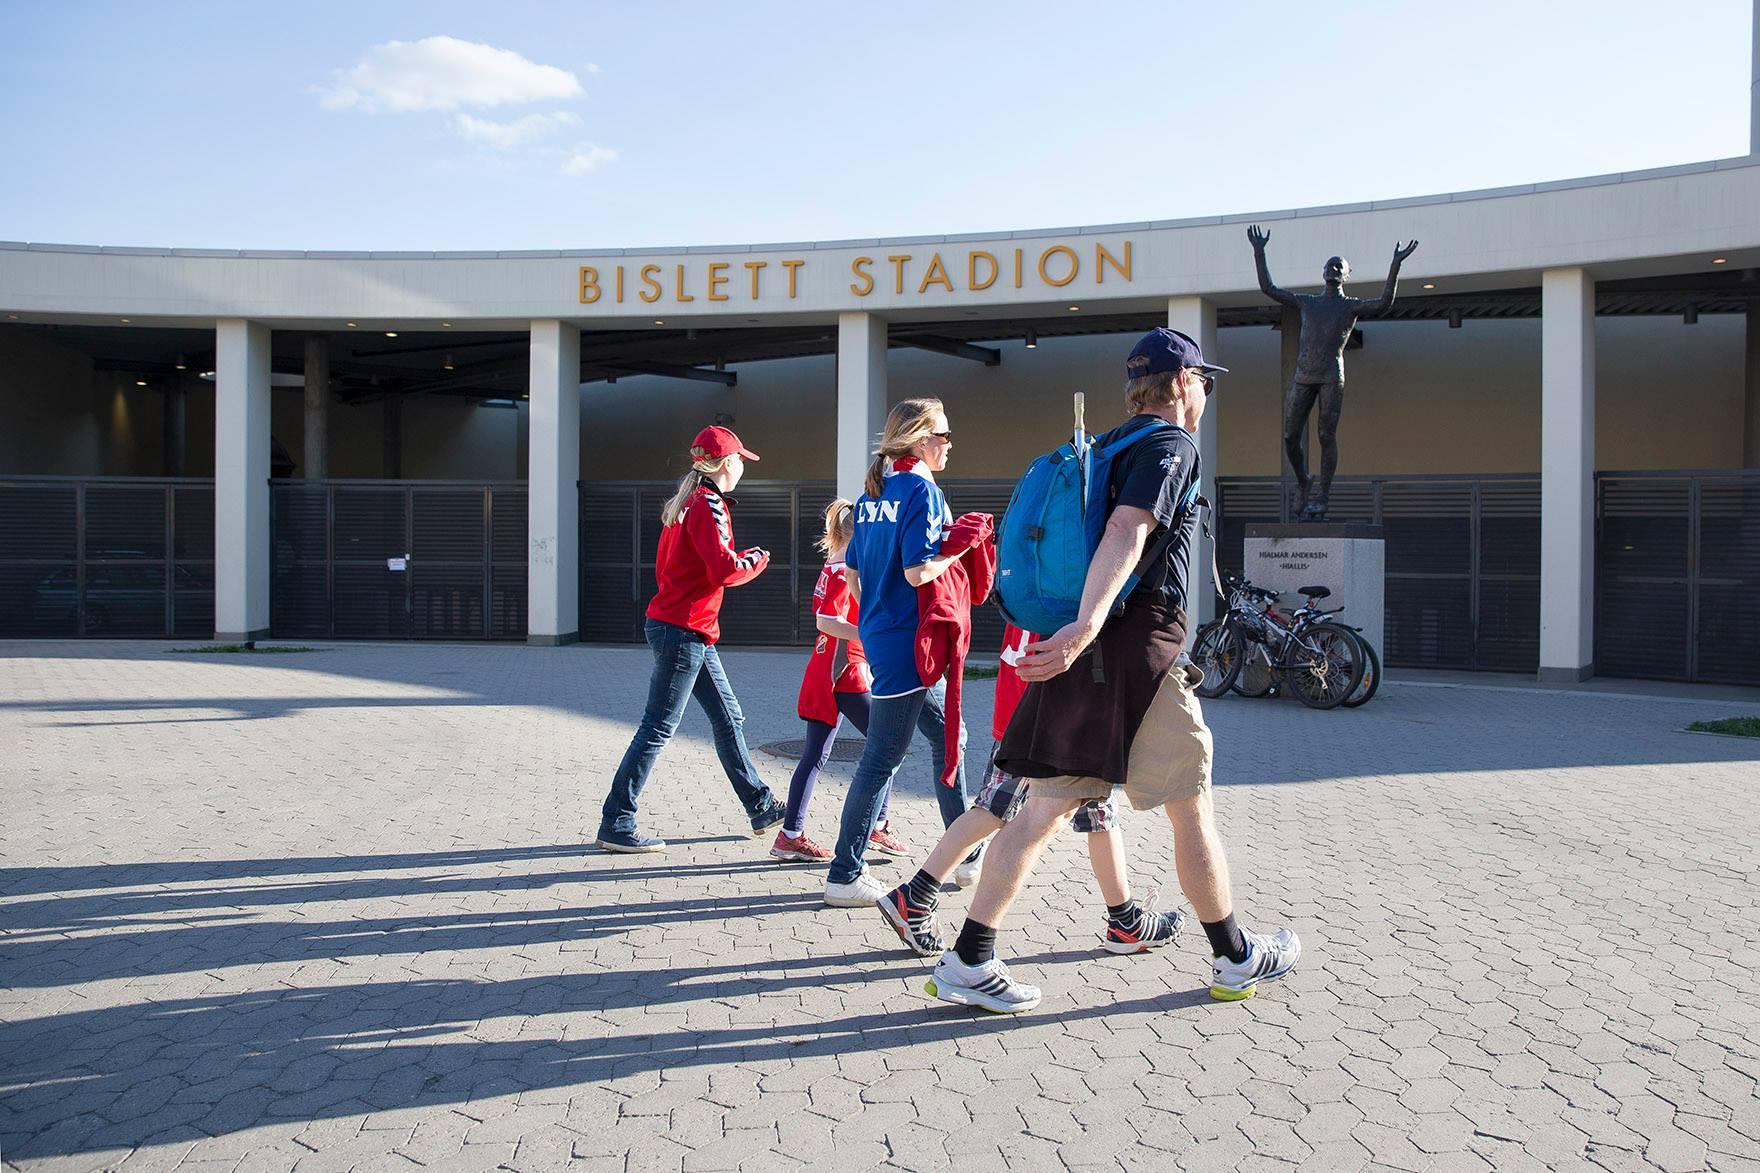 Lyn - Halsen på Bislett stadion på lørdag. Arkivfoto:  BillyBonkers